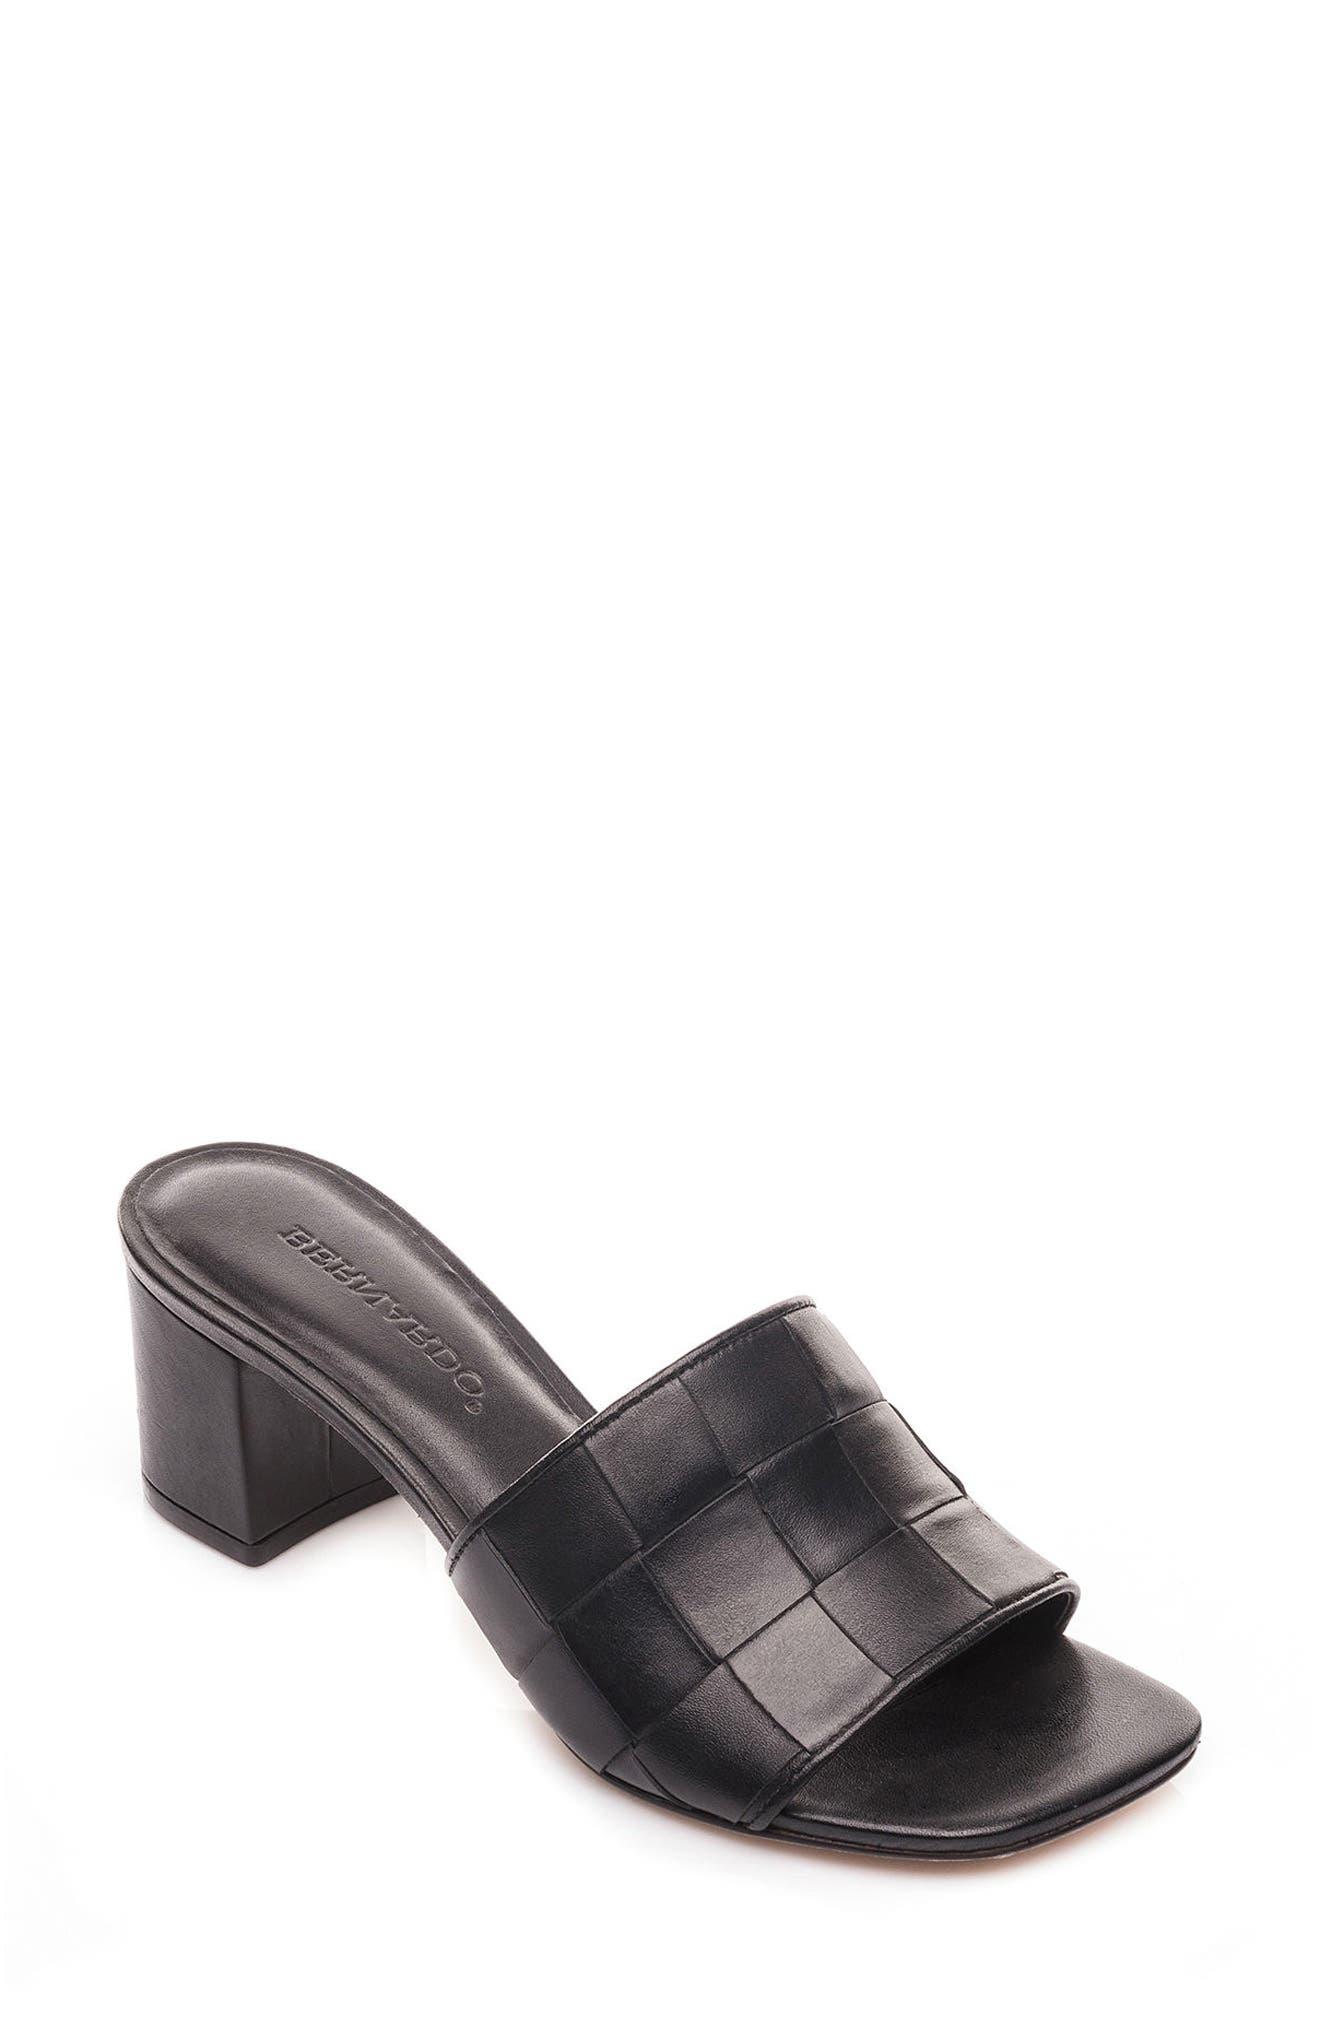 Bernardo Bridget Block Heel Sandal,                         Main,                         color,